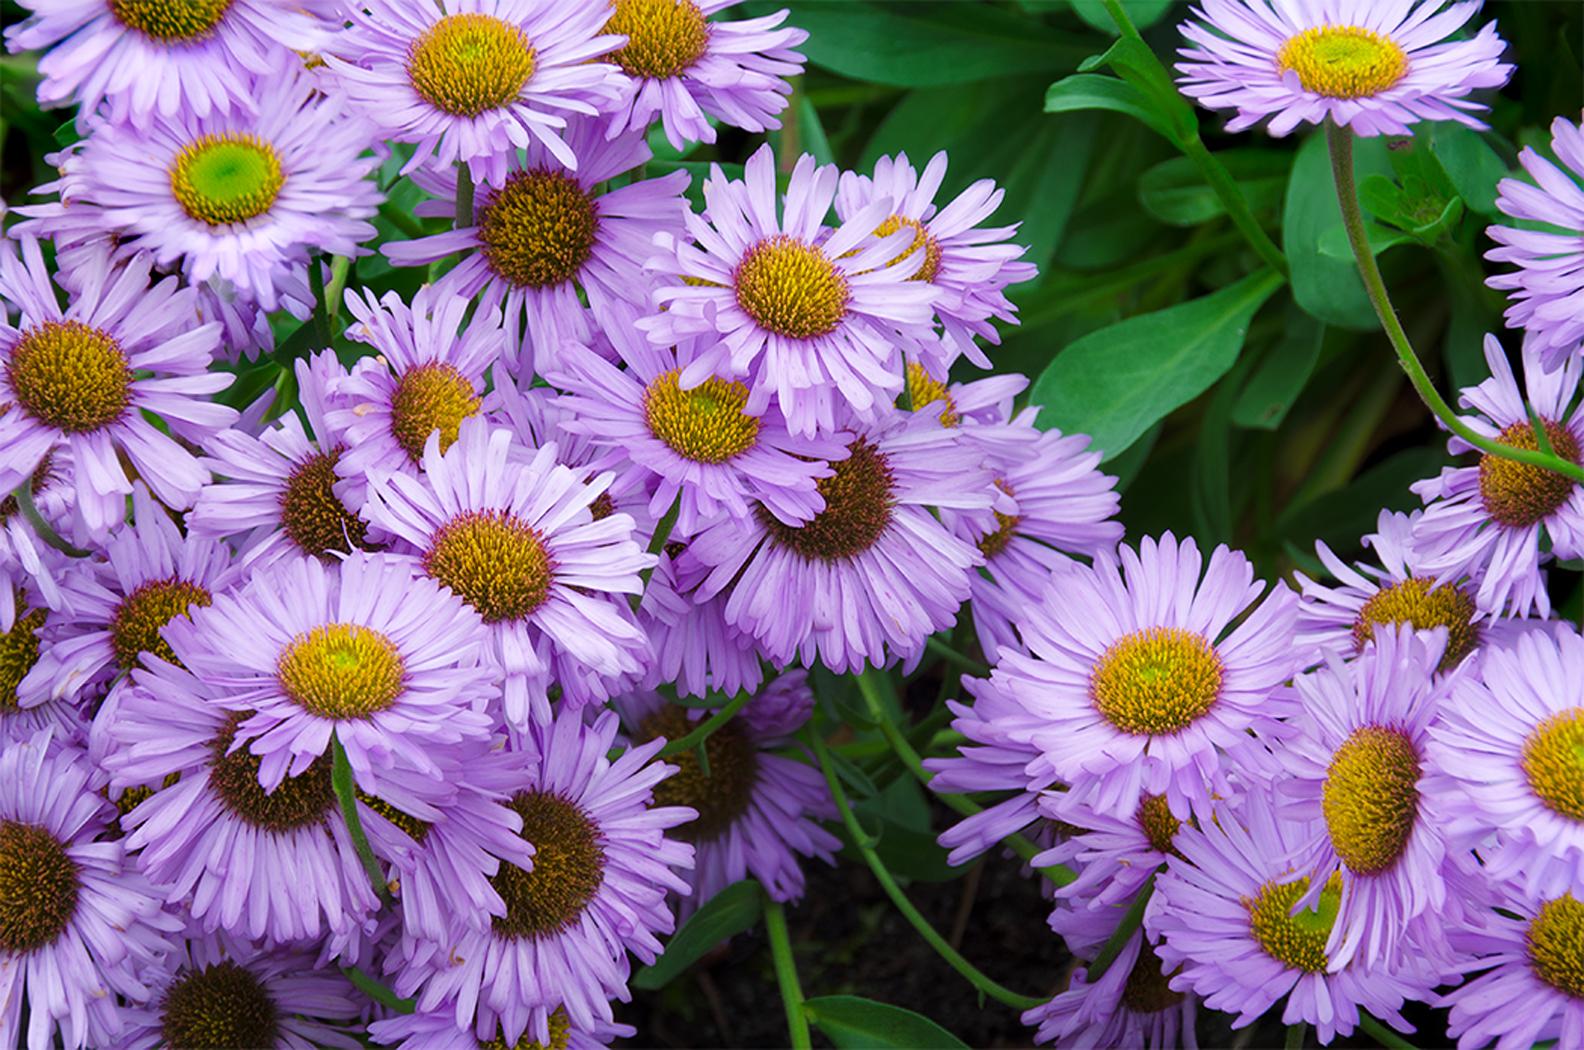 Linda cochran s garden erigeron glaucus wayne roderick quot